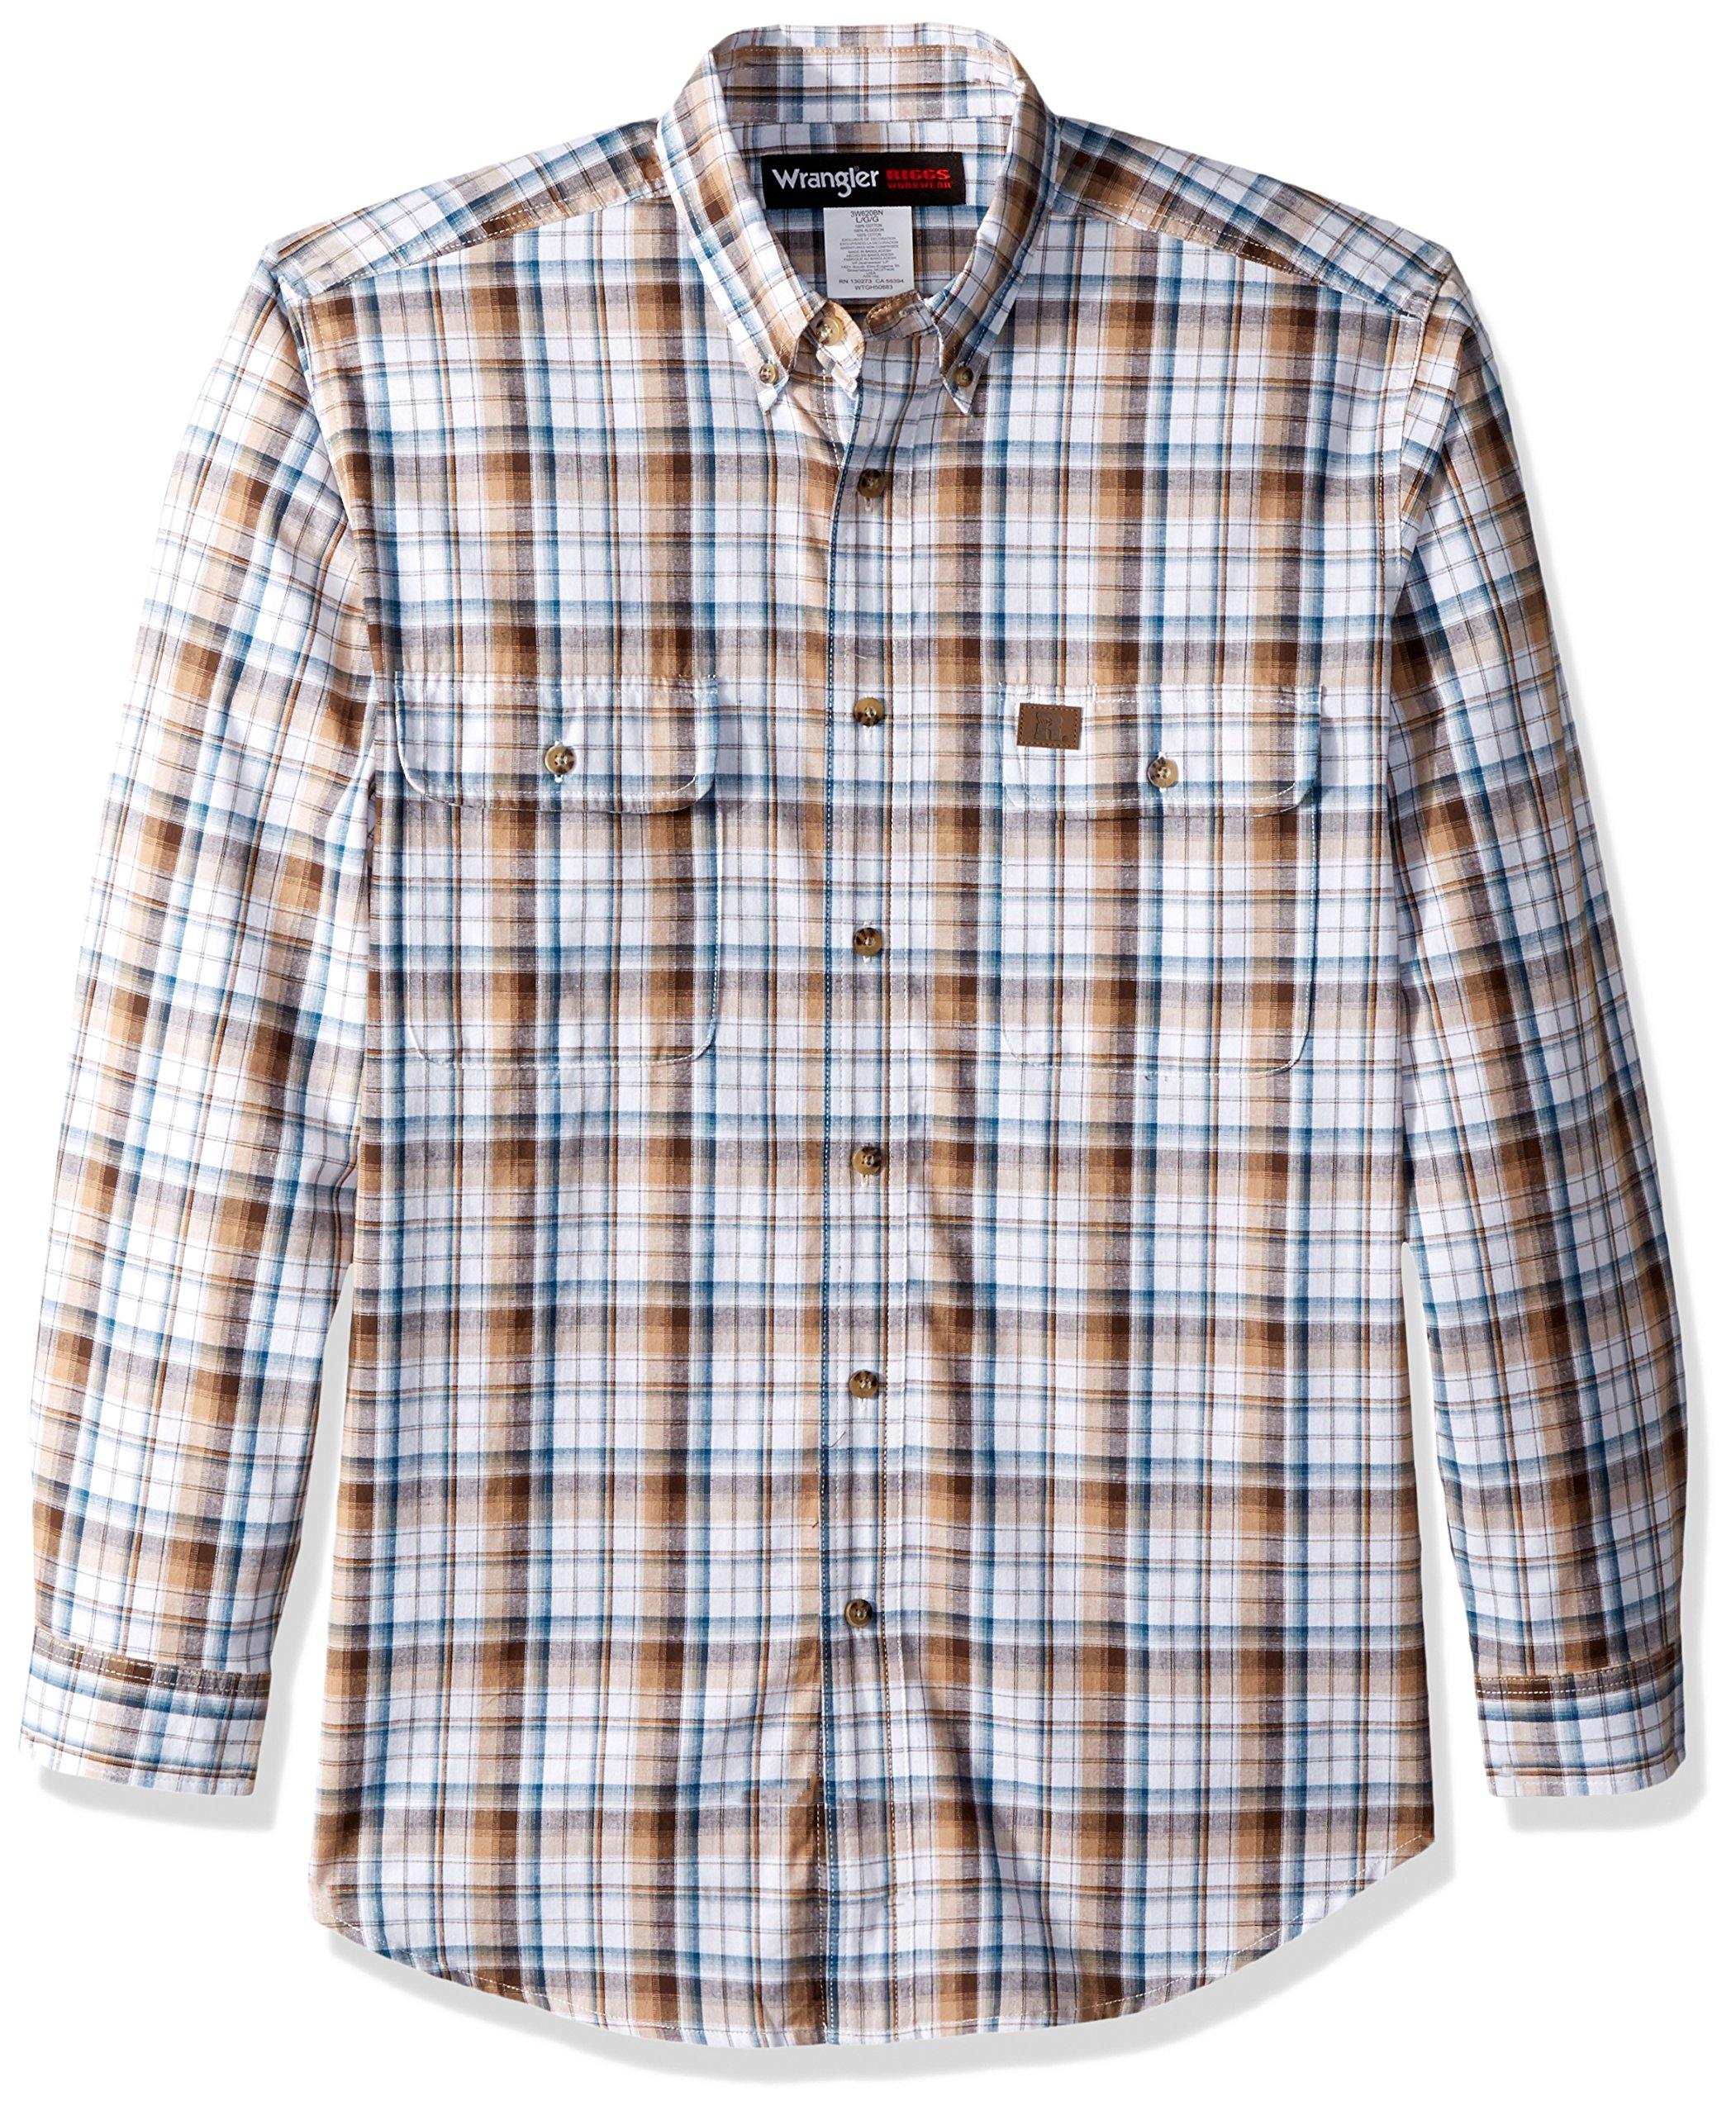 Wrangler Men's Riggs Workwear Foreman Plaid Long Sleeve Work Shirt, Brown, M